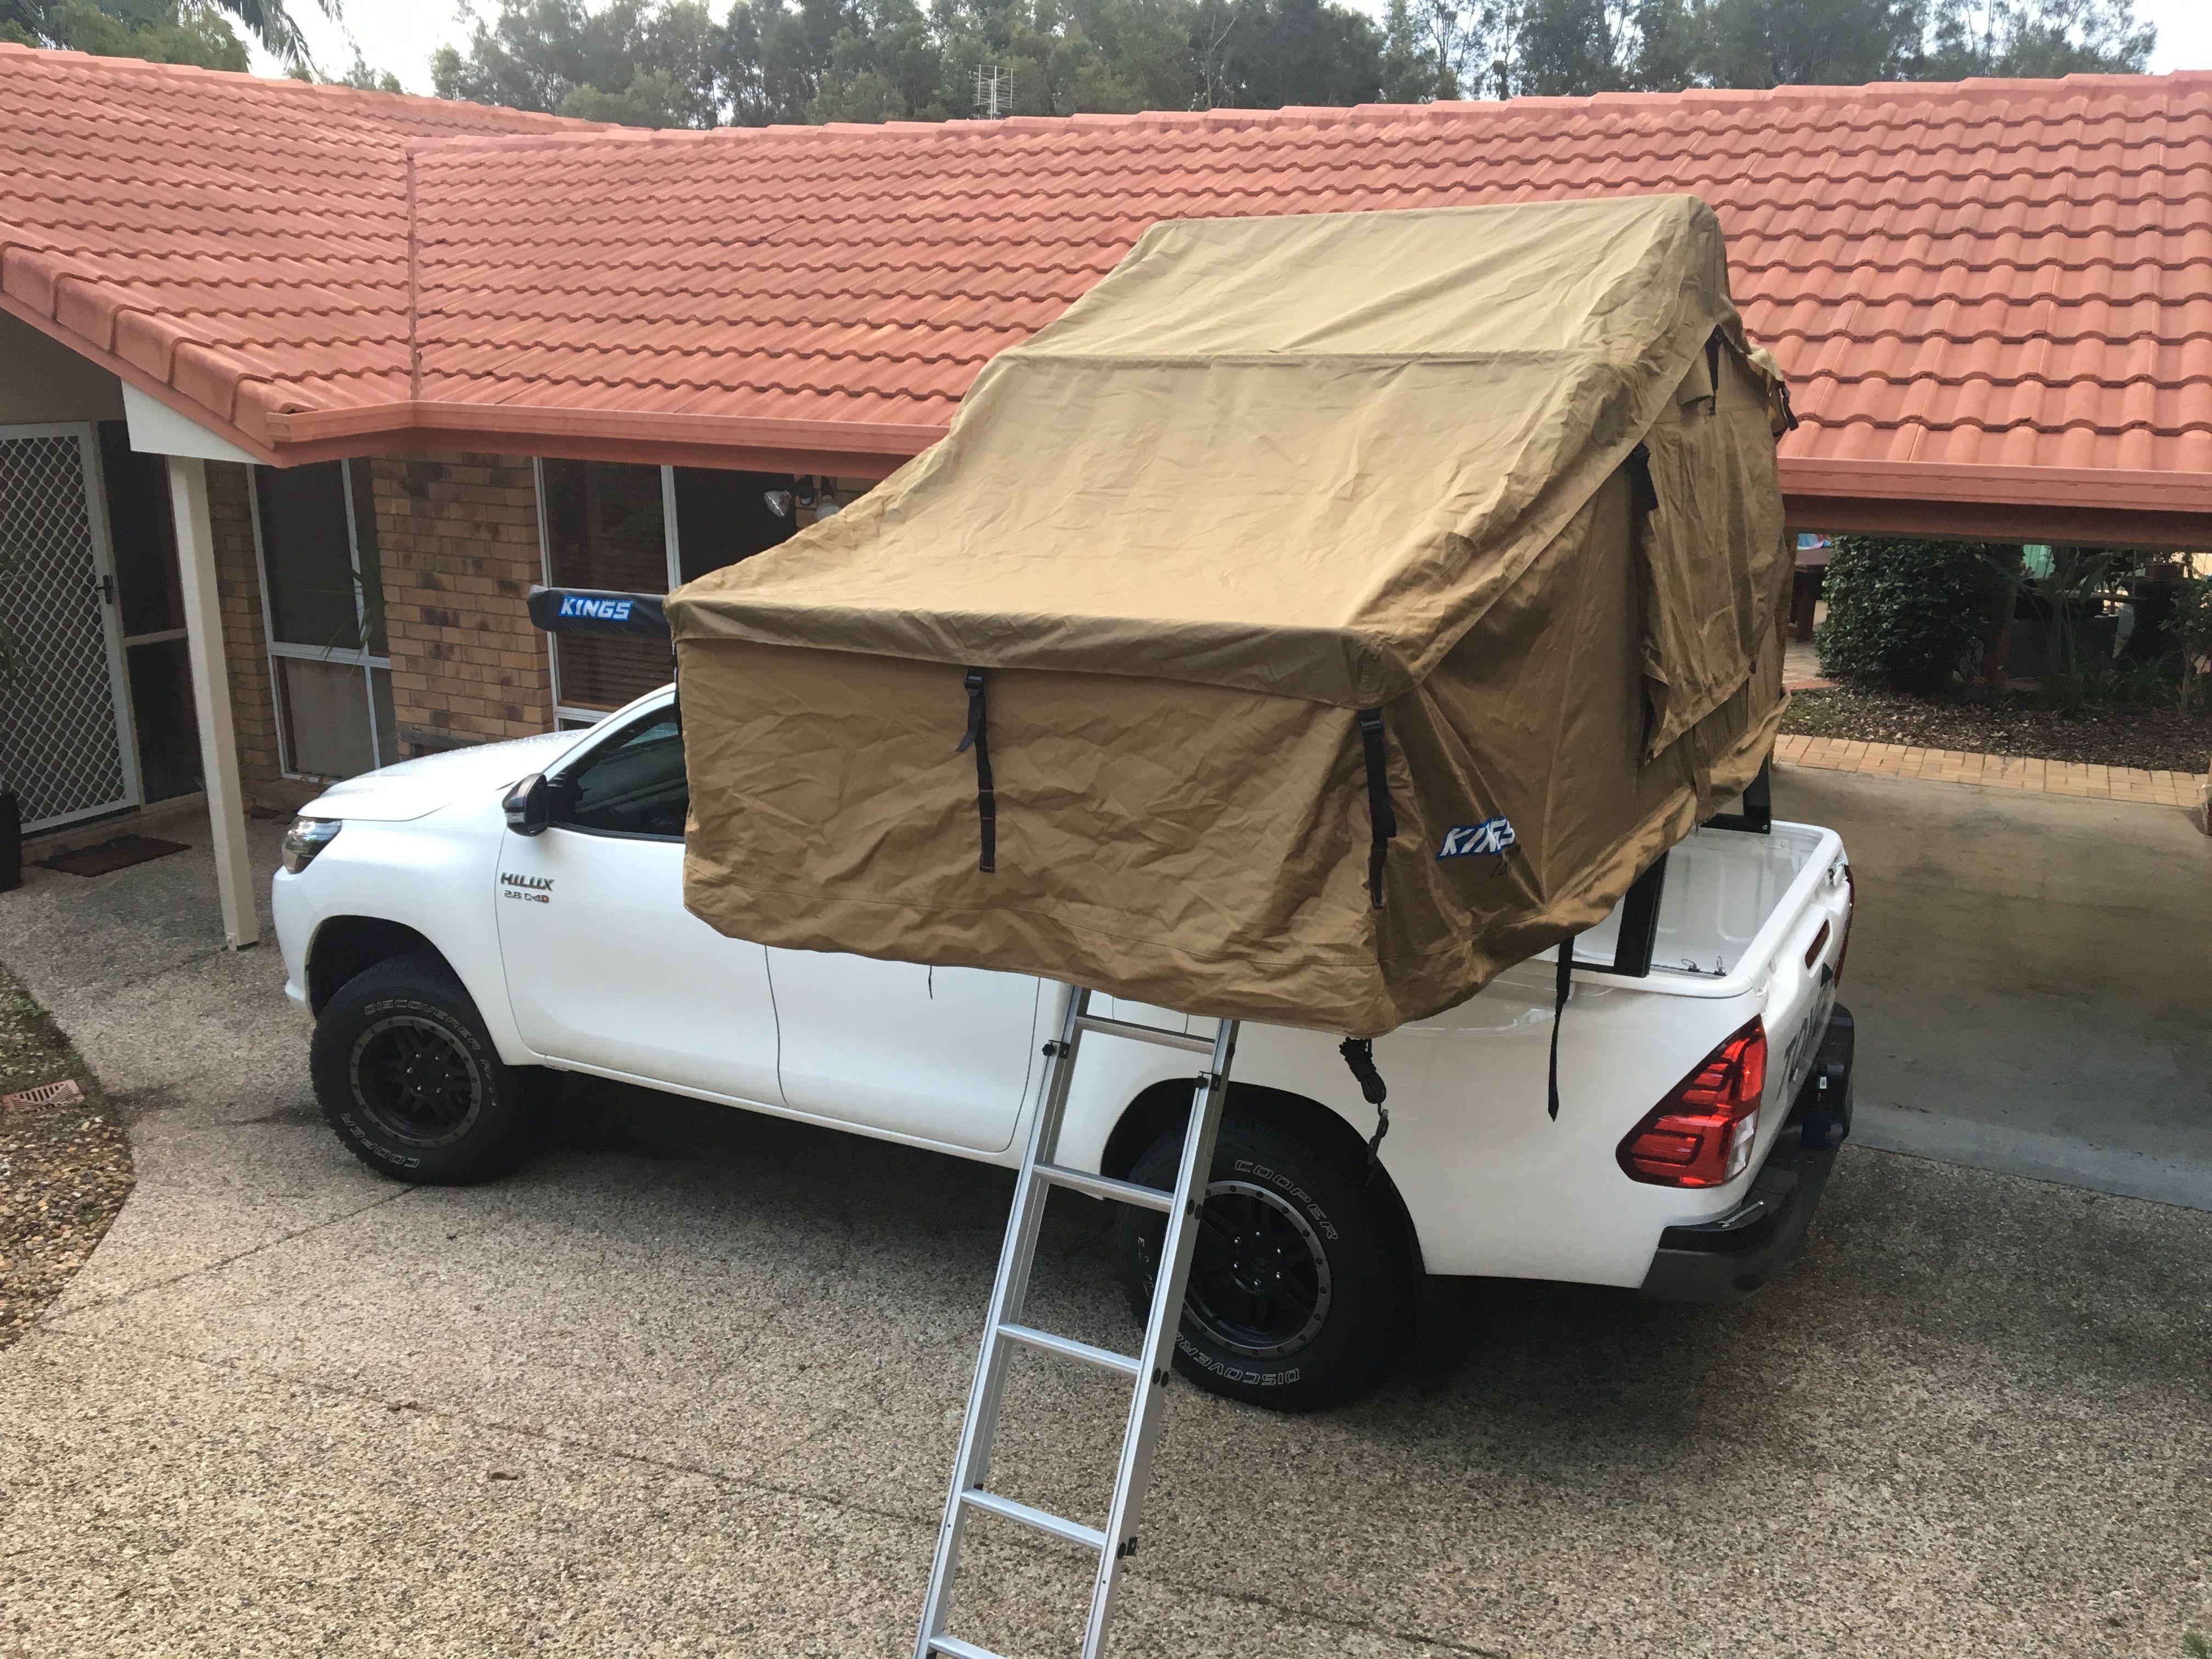 Adventure Kings Roof Top Tent Weight rooftop tent toyota hilux bed rack | roof top tent, toyota